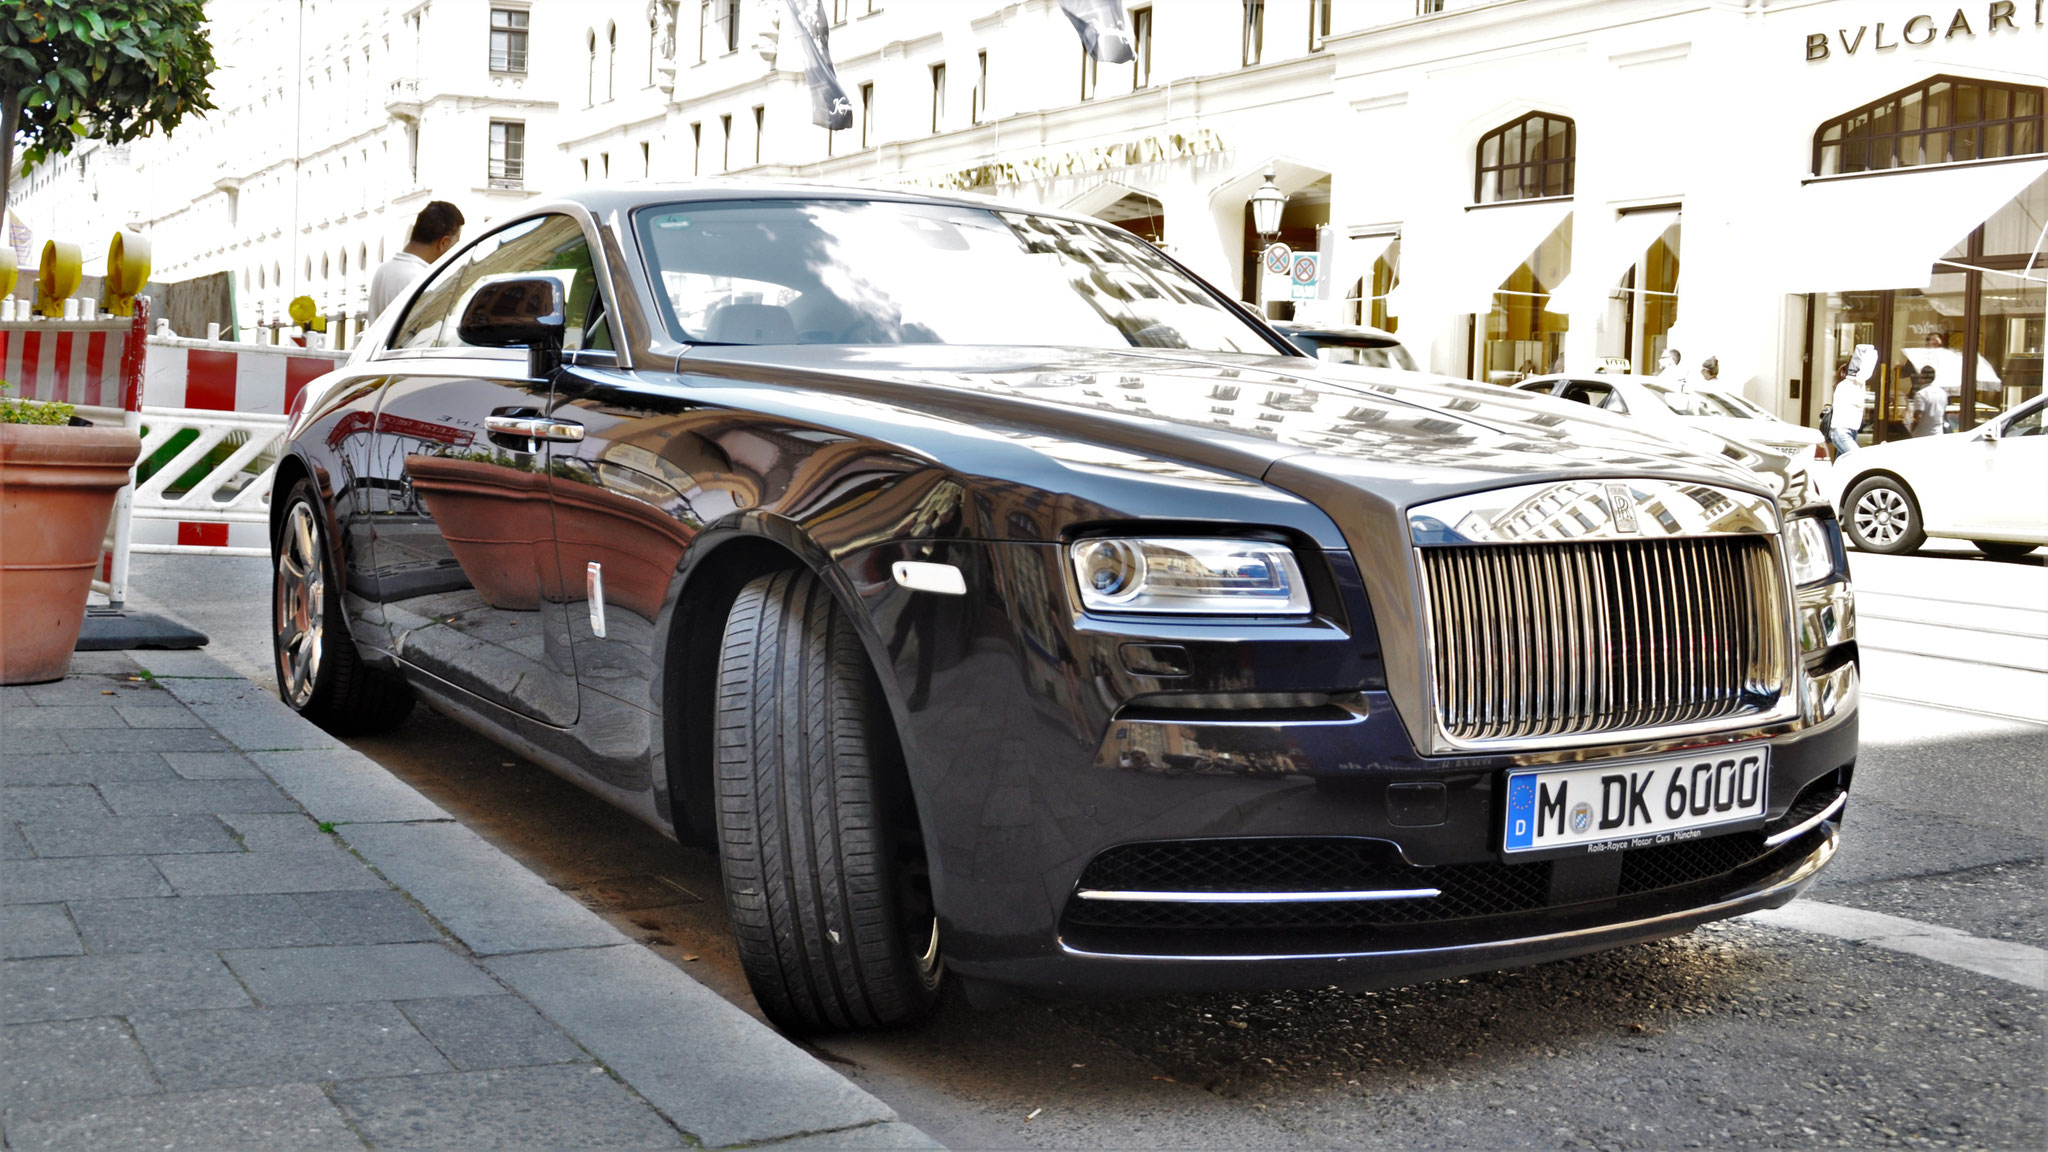 Rolls Royce Wraith - M-DK-6000